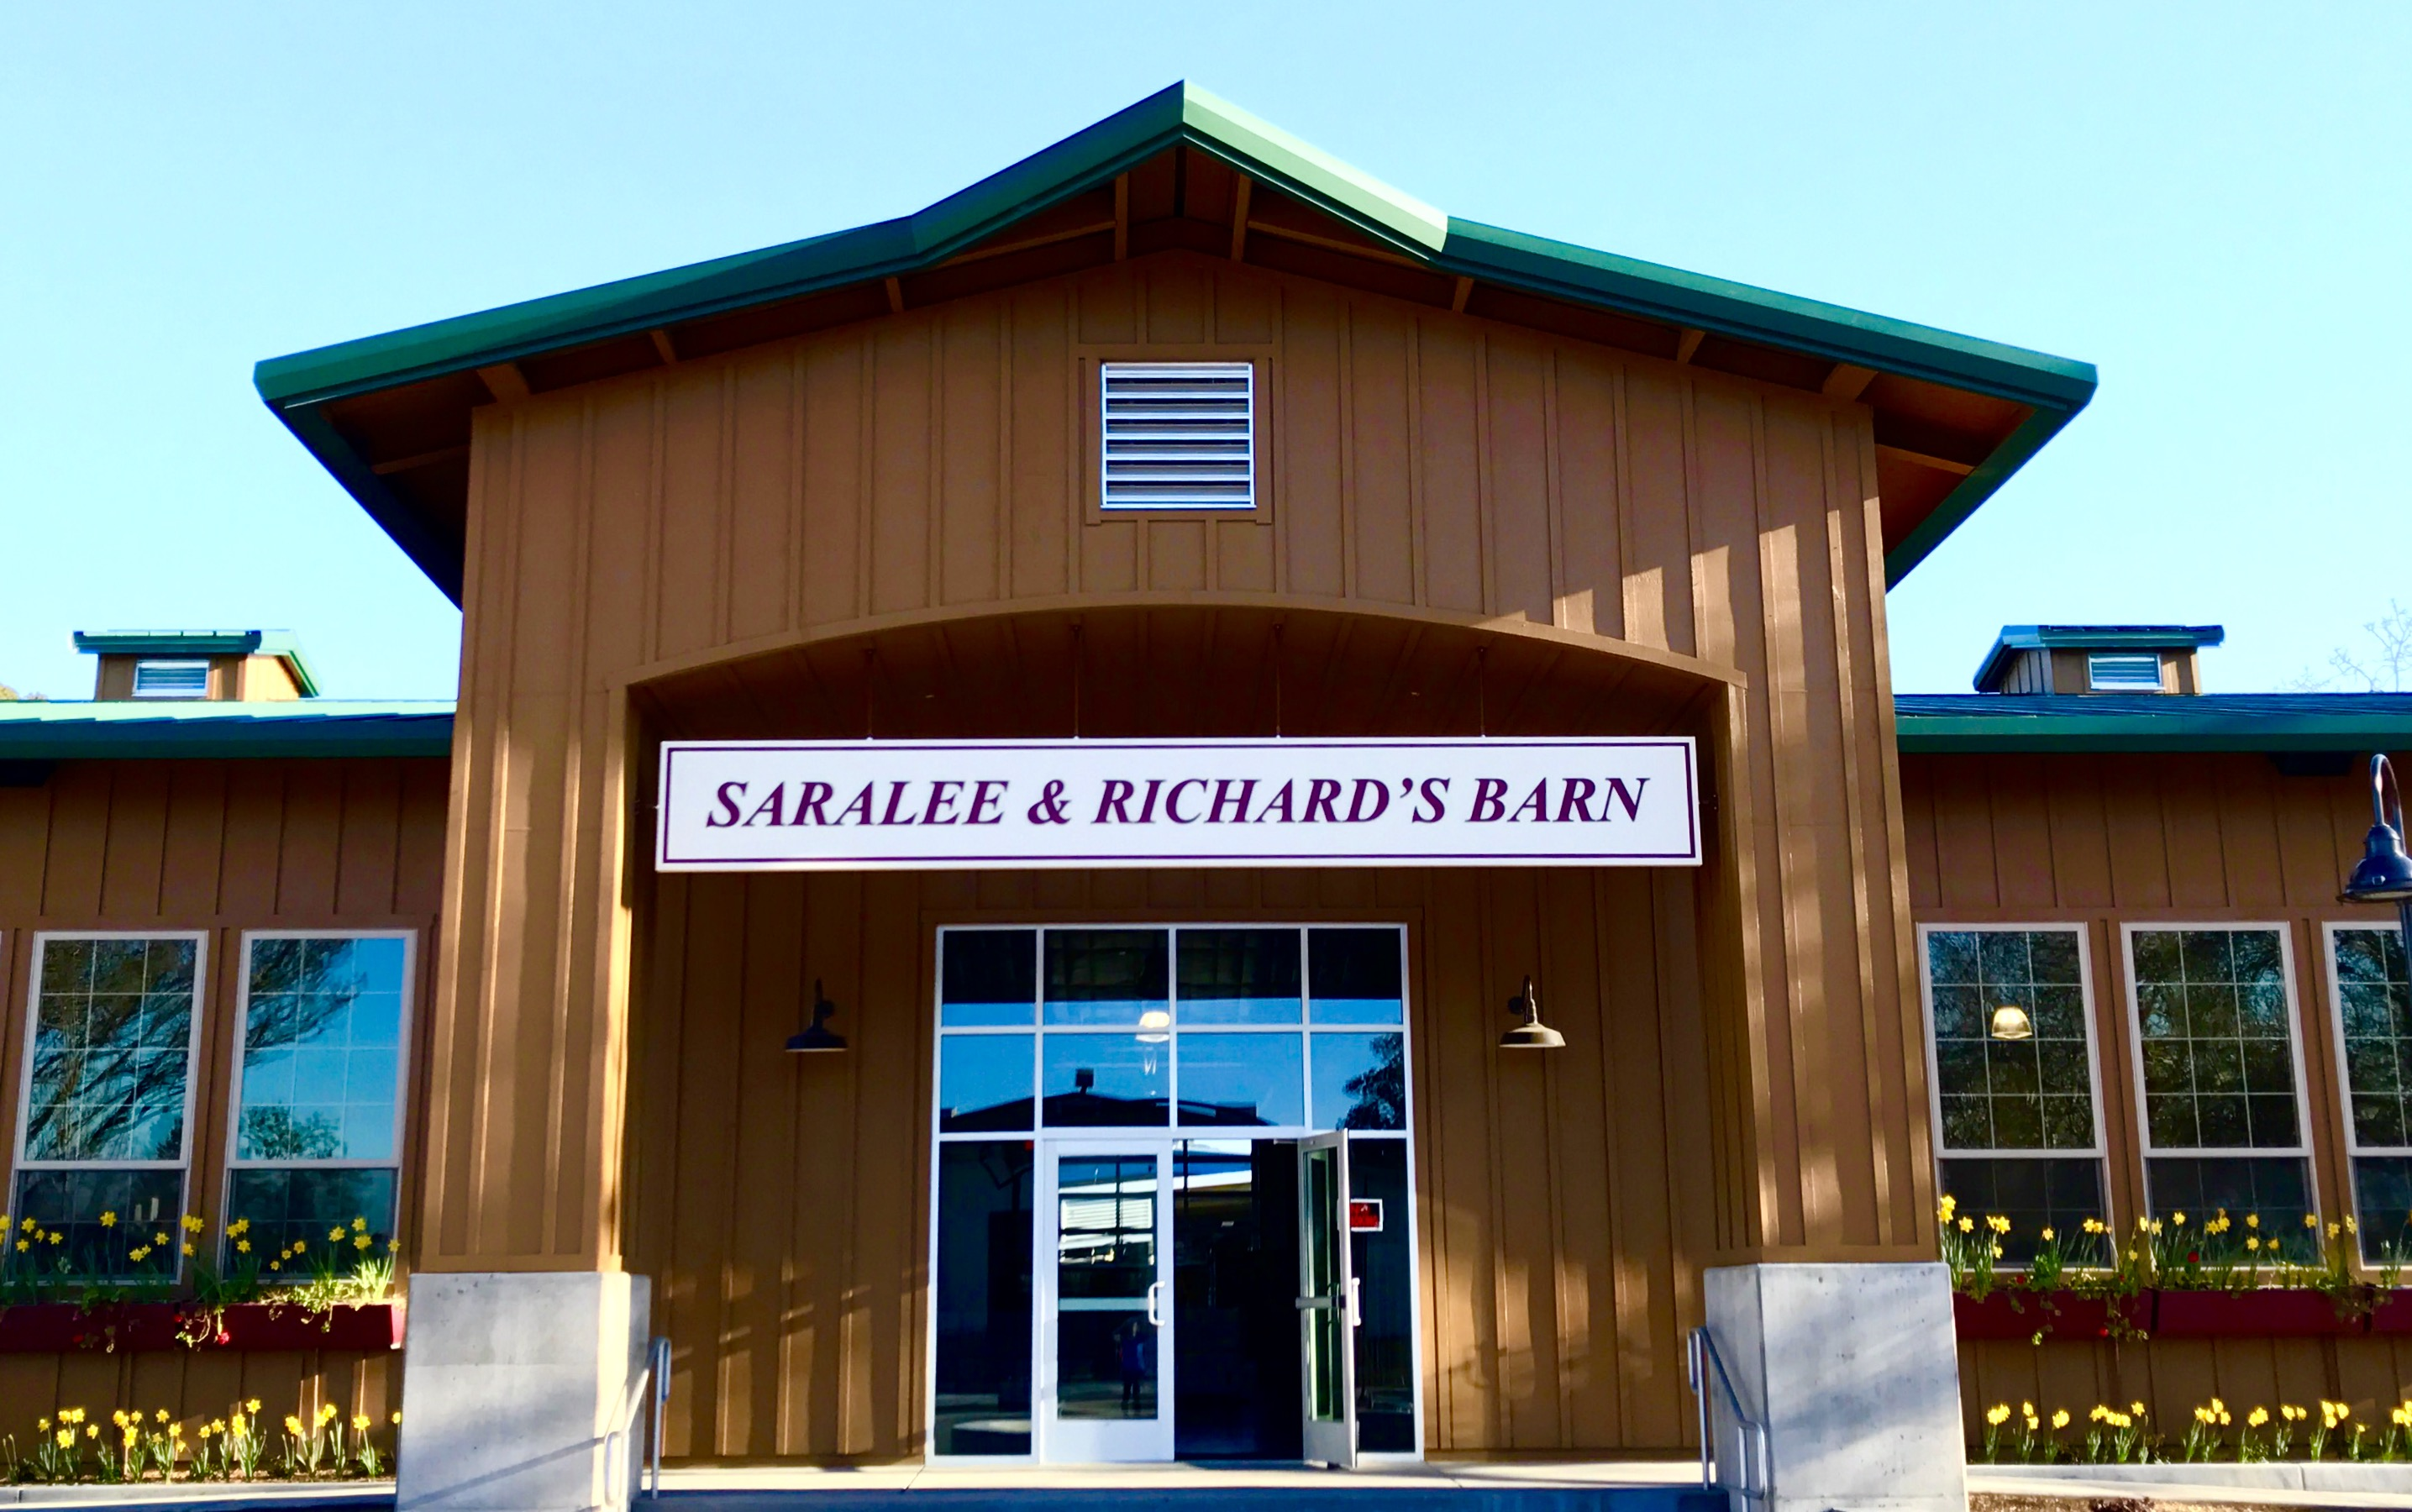 Saralee & Richard's Barn Front